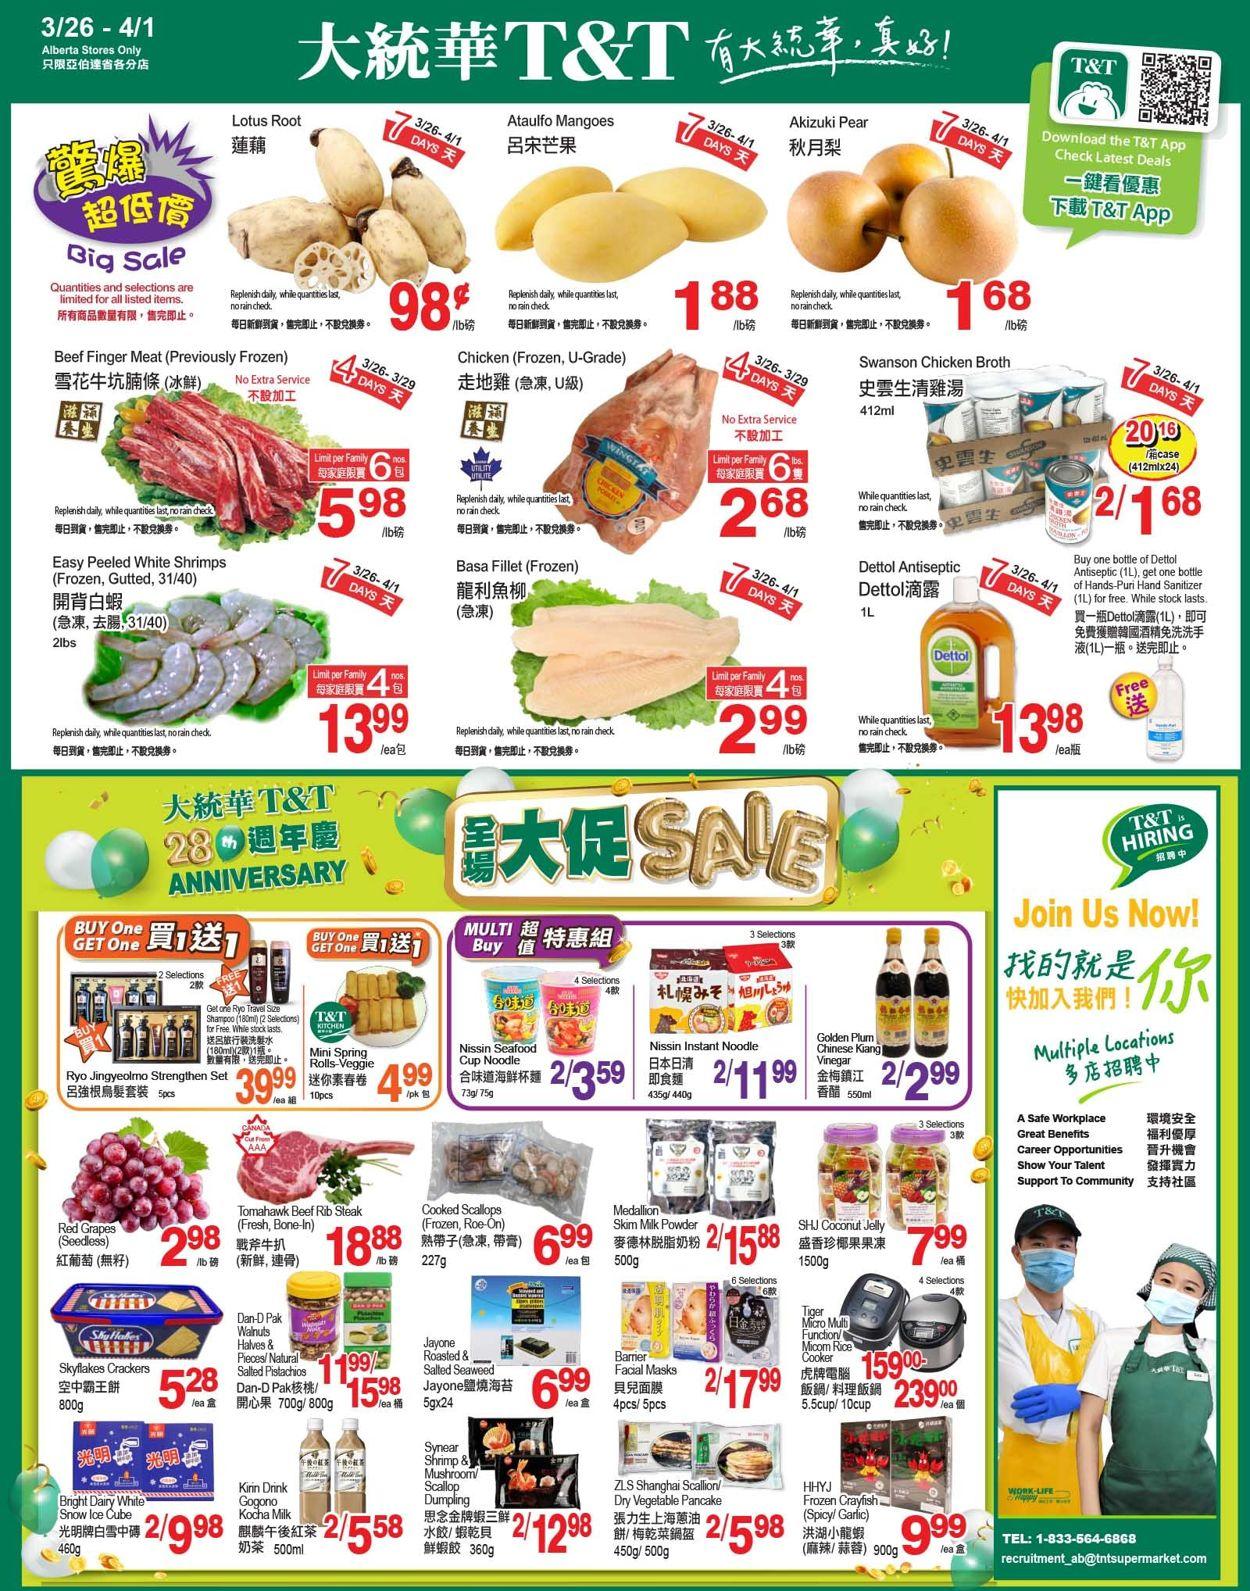 T&T Supermarket - Alberta Flyer - 03/26-04/01/2021